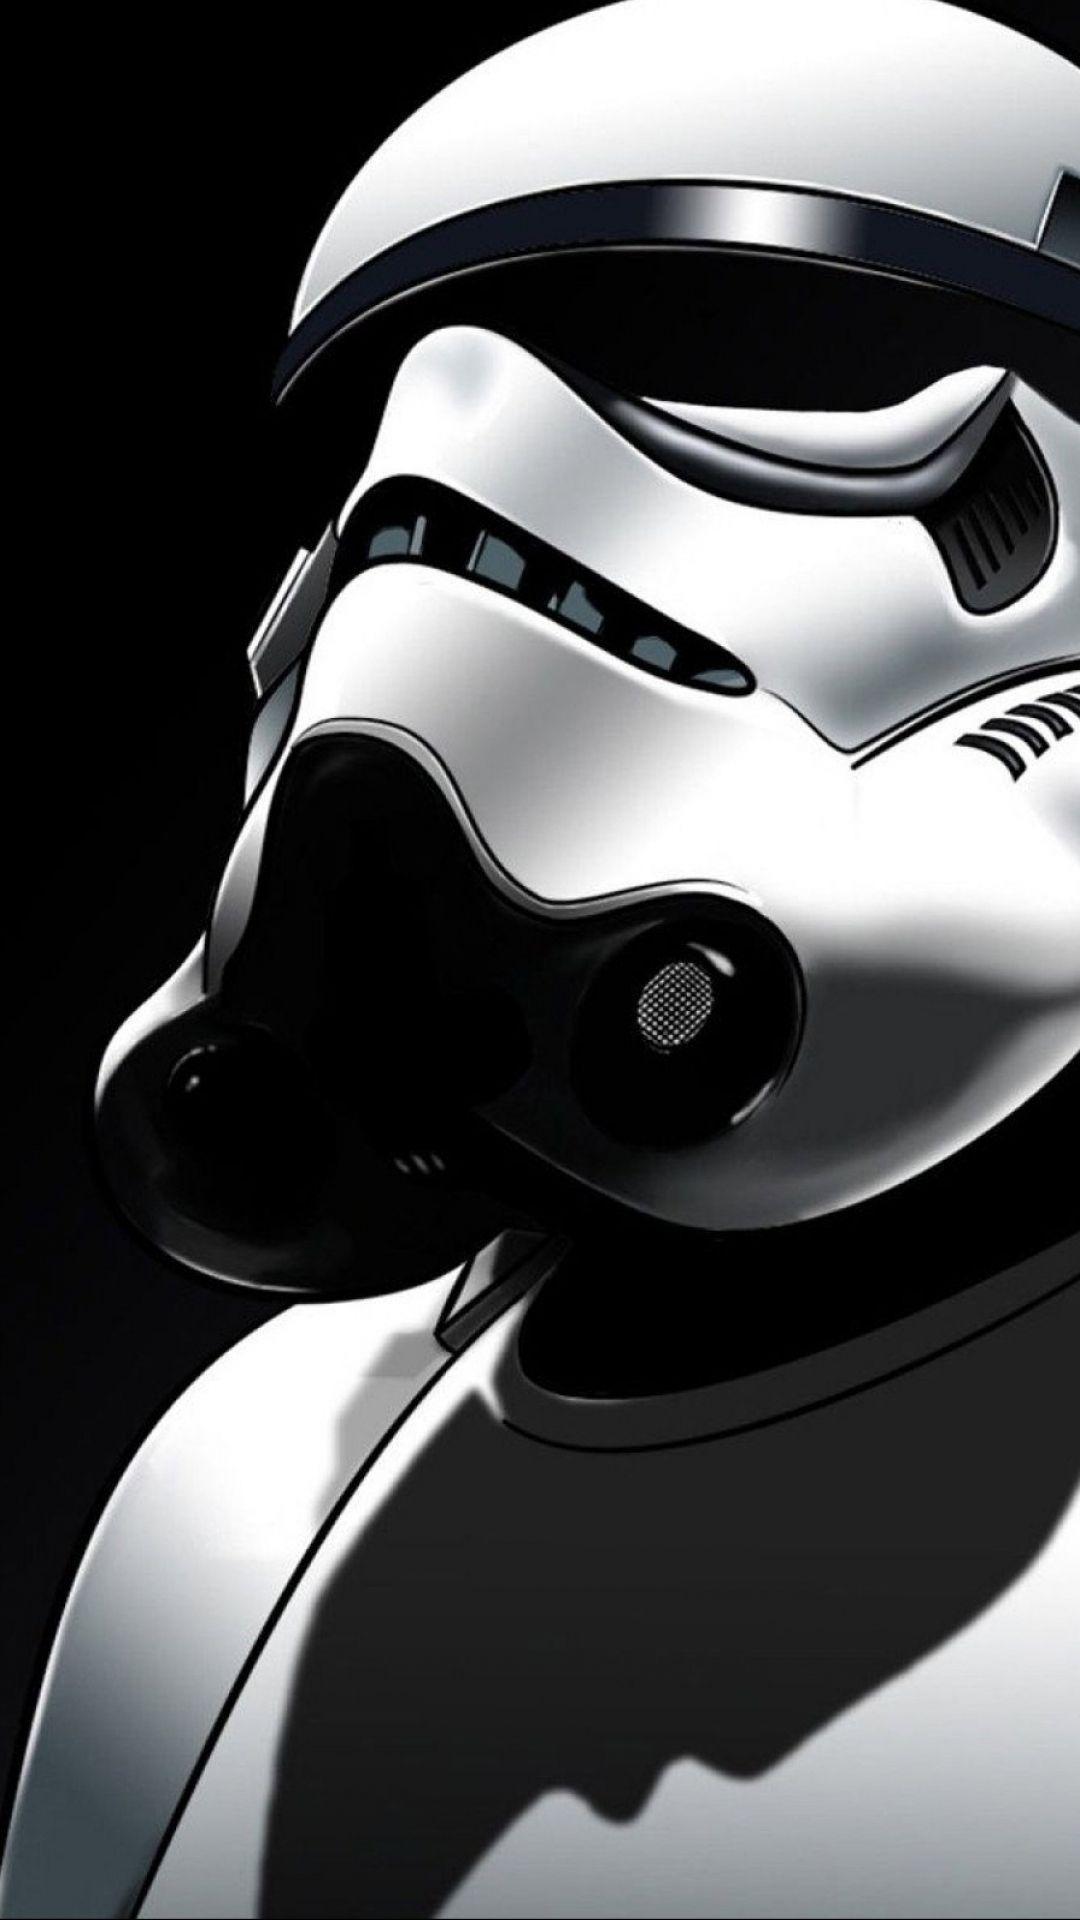 Stormtrooper Iphone Wallpapers Top Free Stormtrooper Iphone Backgrounds Wallpaperaccess